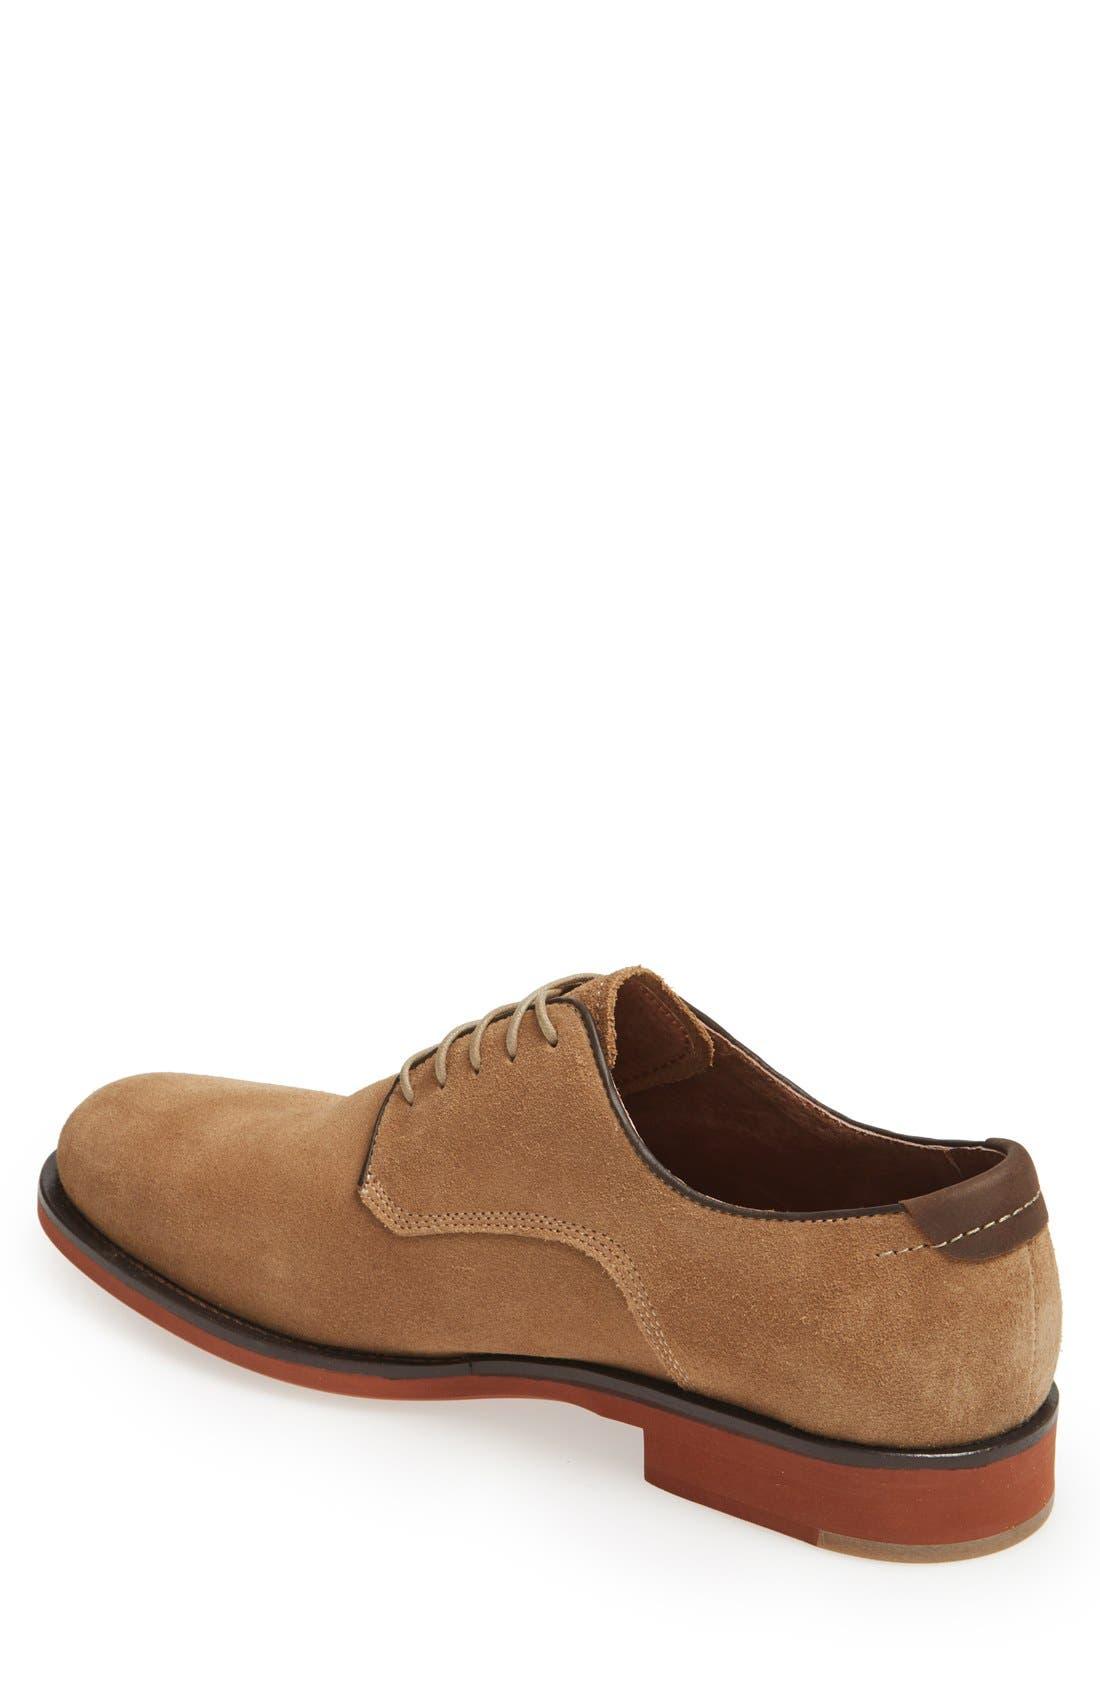 Alternate Image 2  - Johnston & Murphy 'Ellington' Suede Buck Shoe (Men)